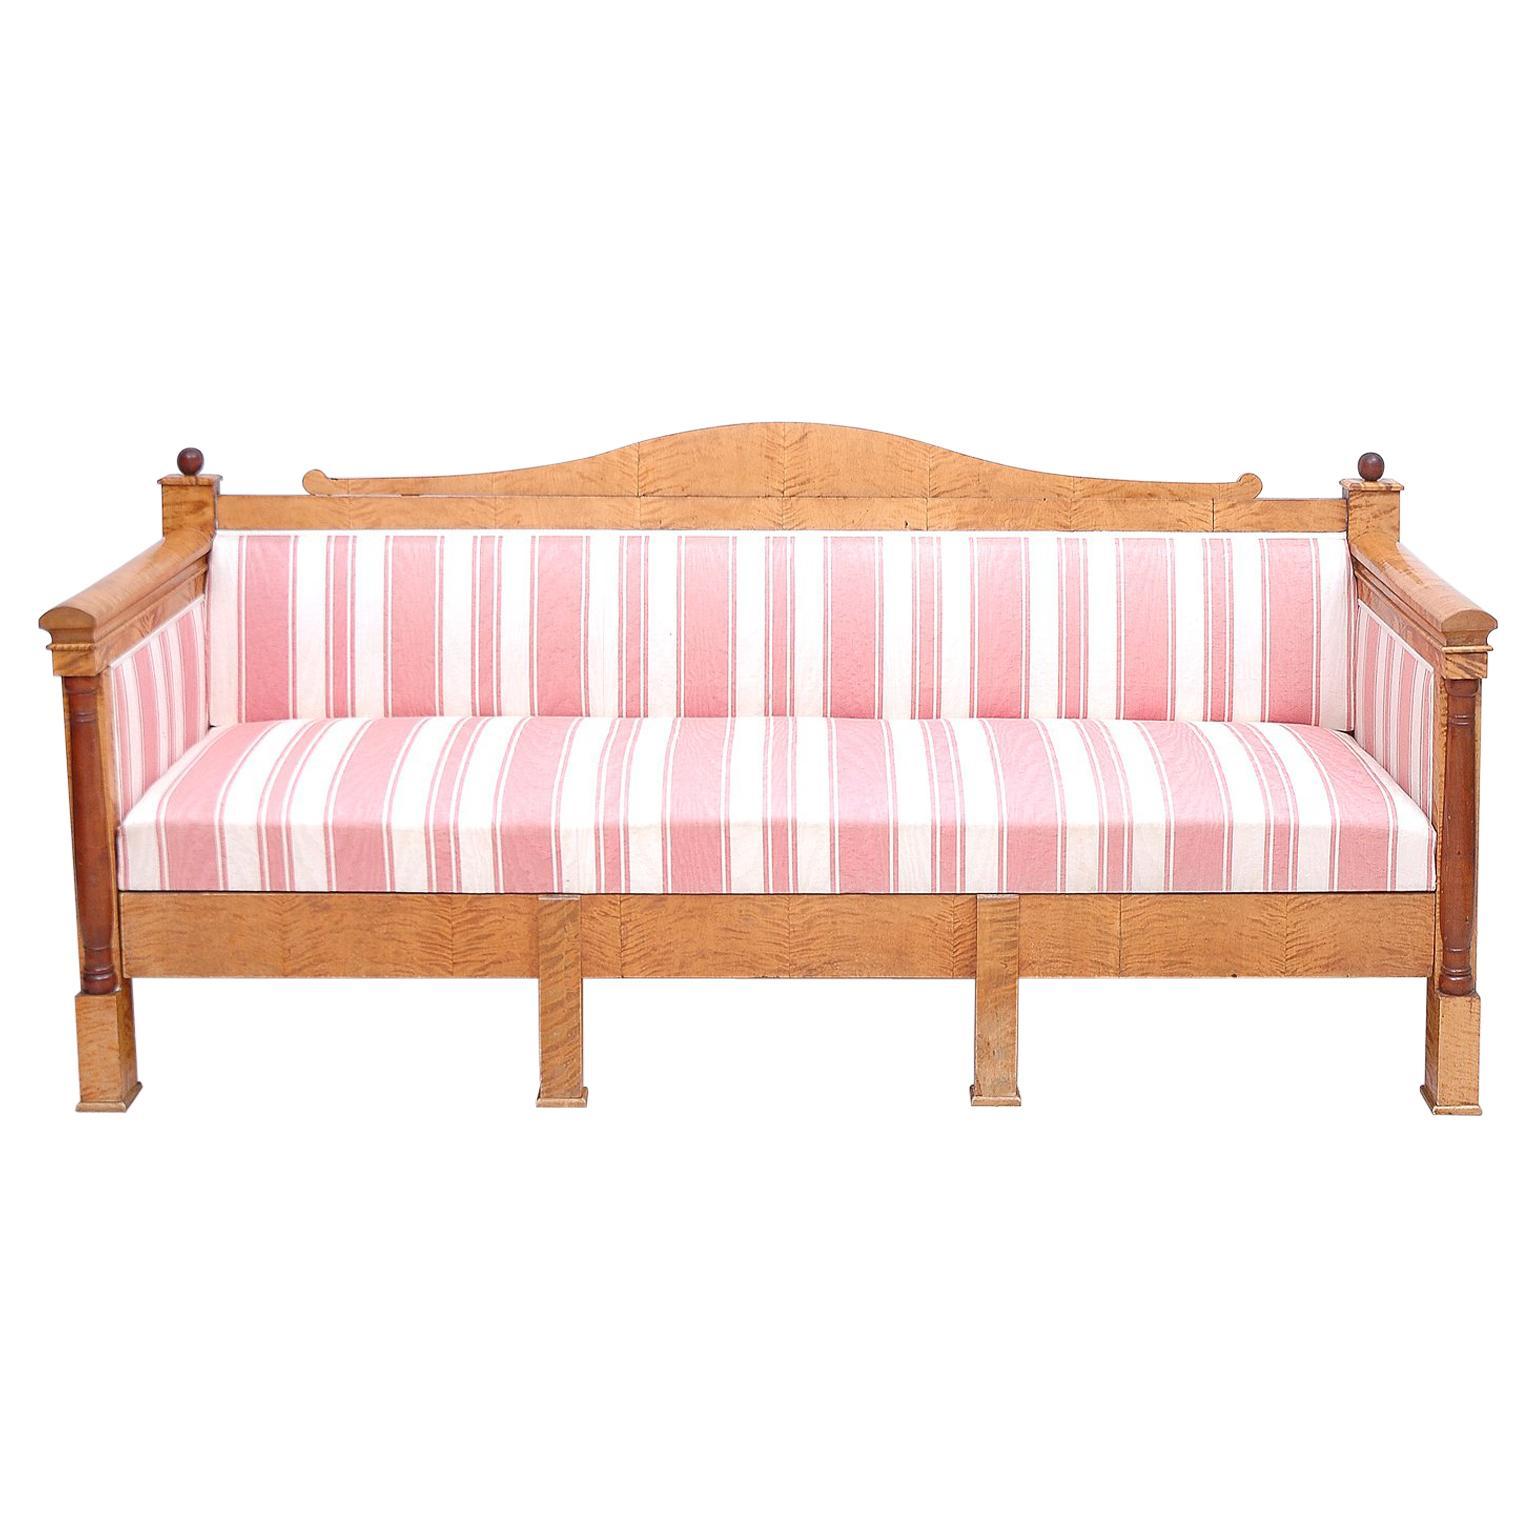 Scandinavian Biedermeier Sofa or Upholstered Bench in Birch, circa 1830